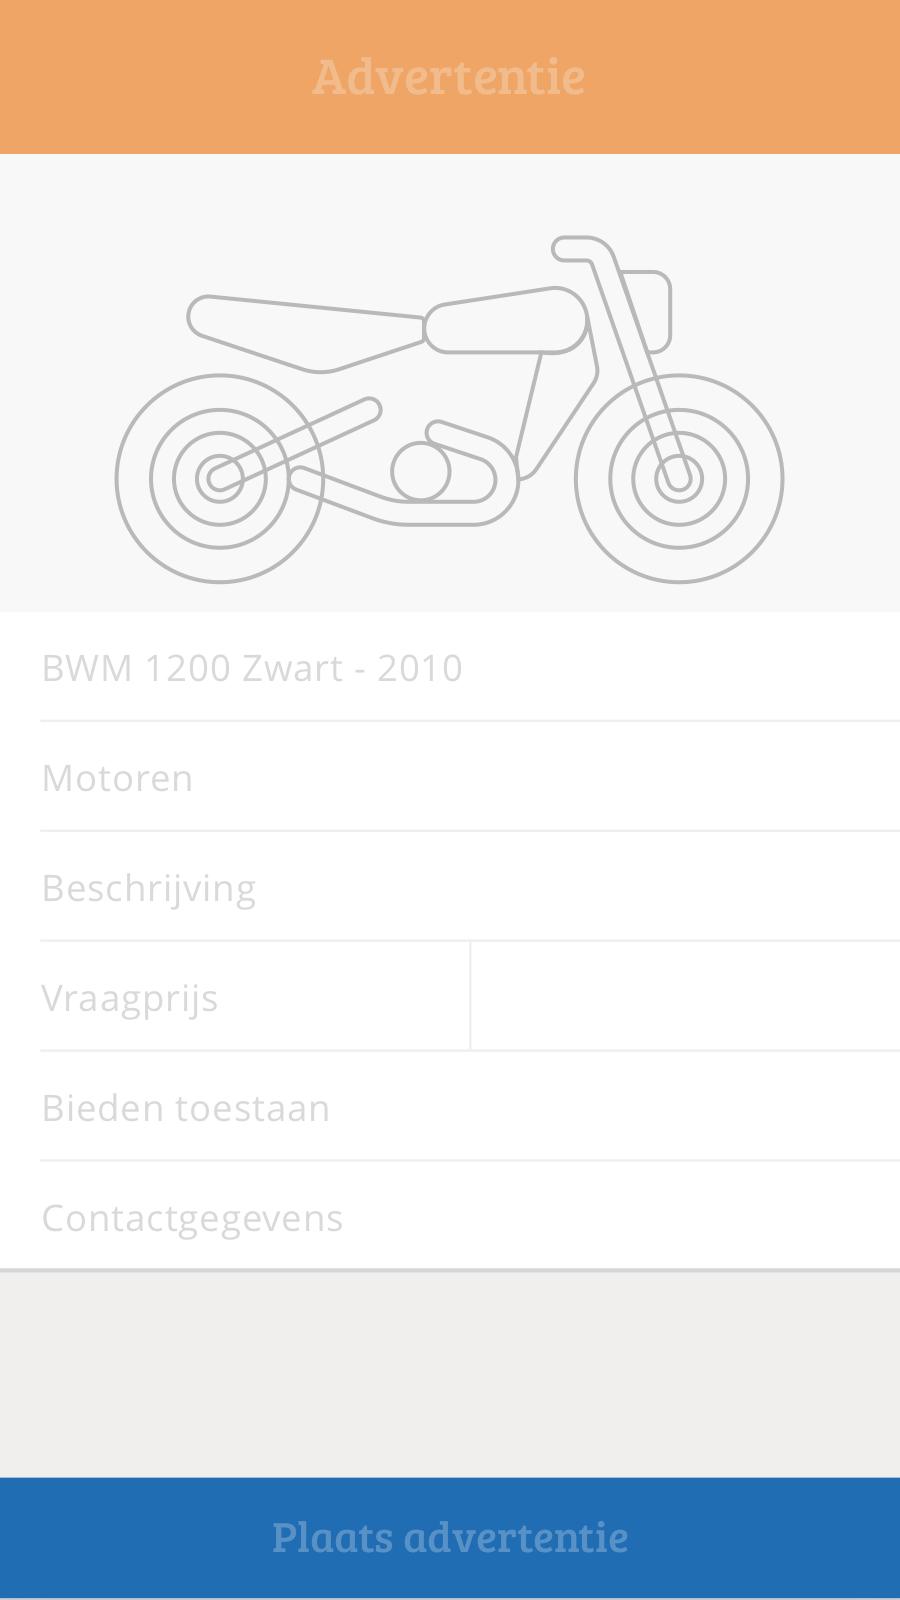 App-schets-2